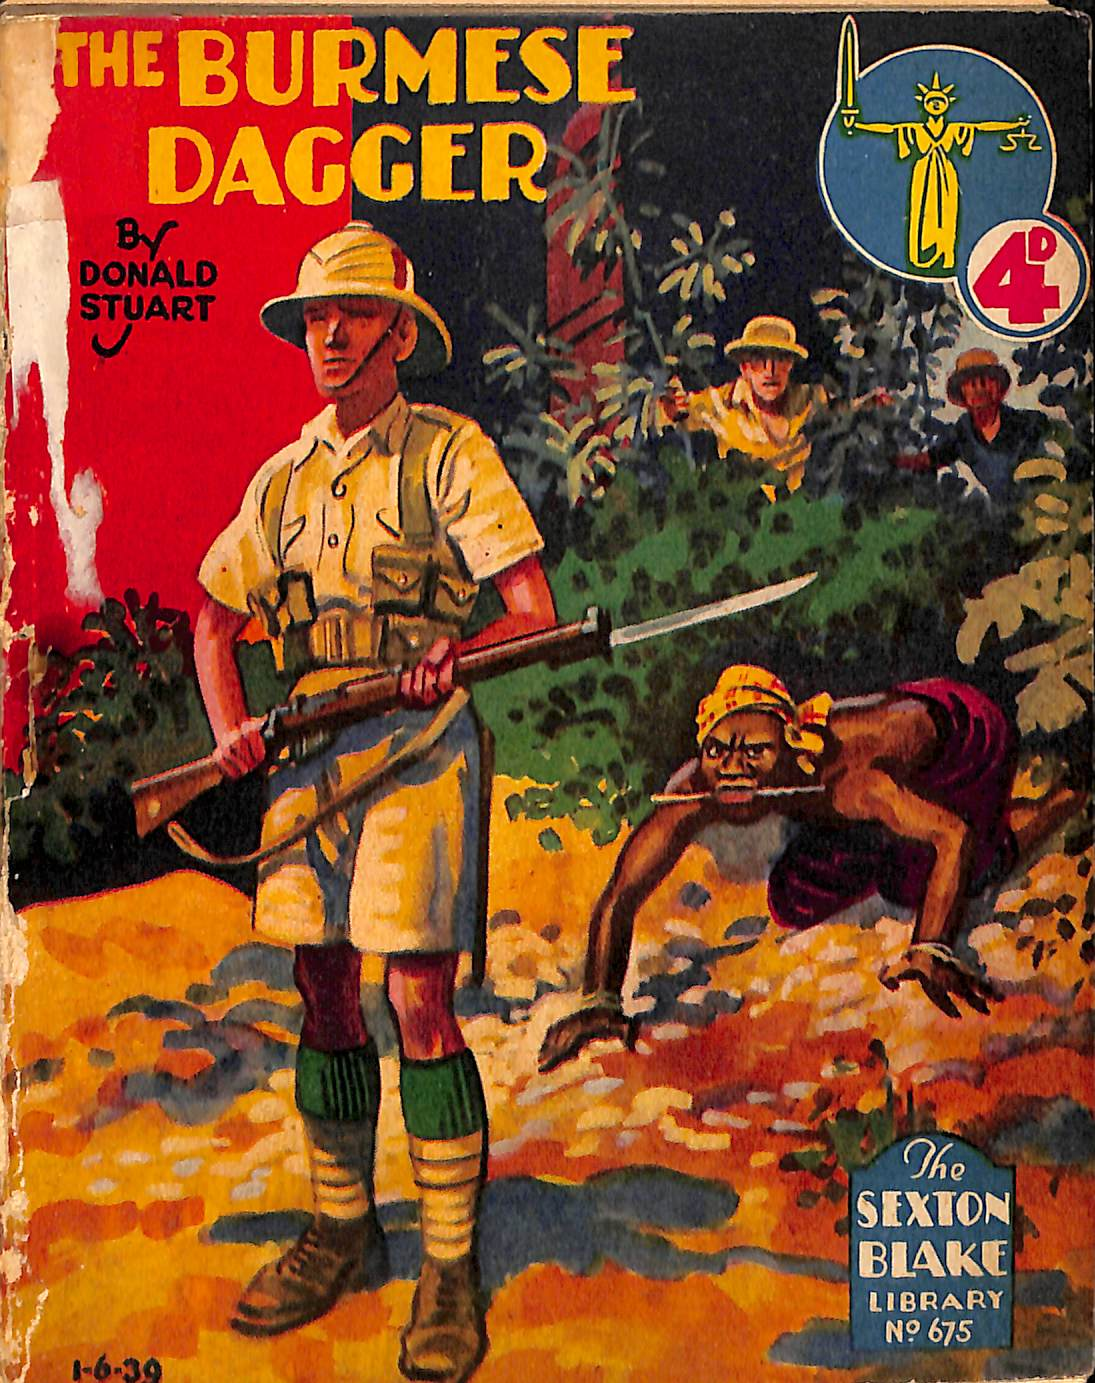 Comic Book Cover For Sexton Blake Library S2 675 - The Burmese Dagger